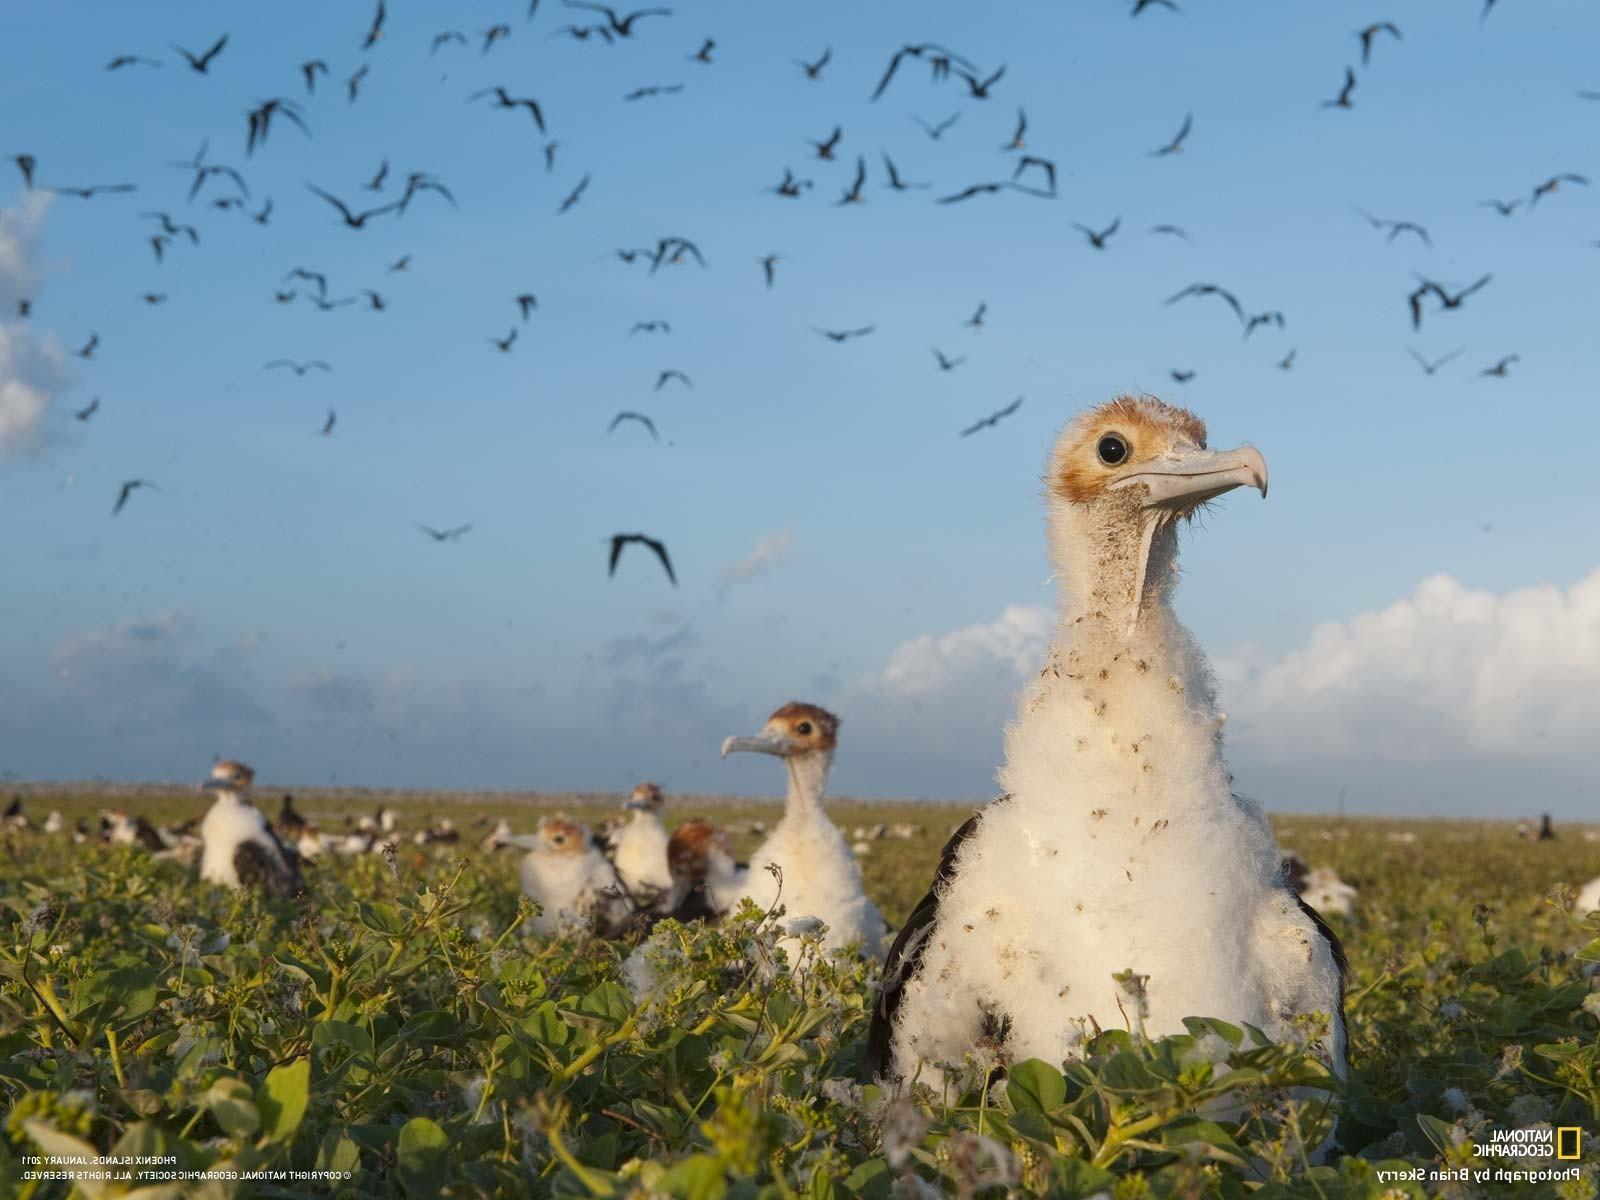 Wallpaper Birds Wildlife National Geographic Flock Fauna